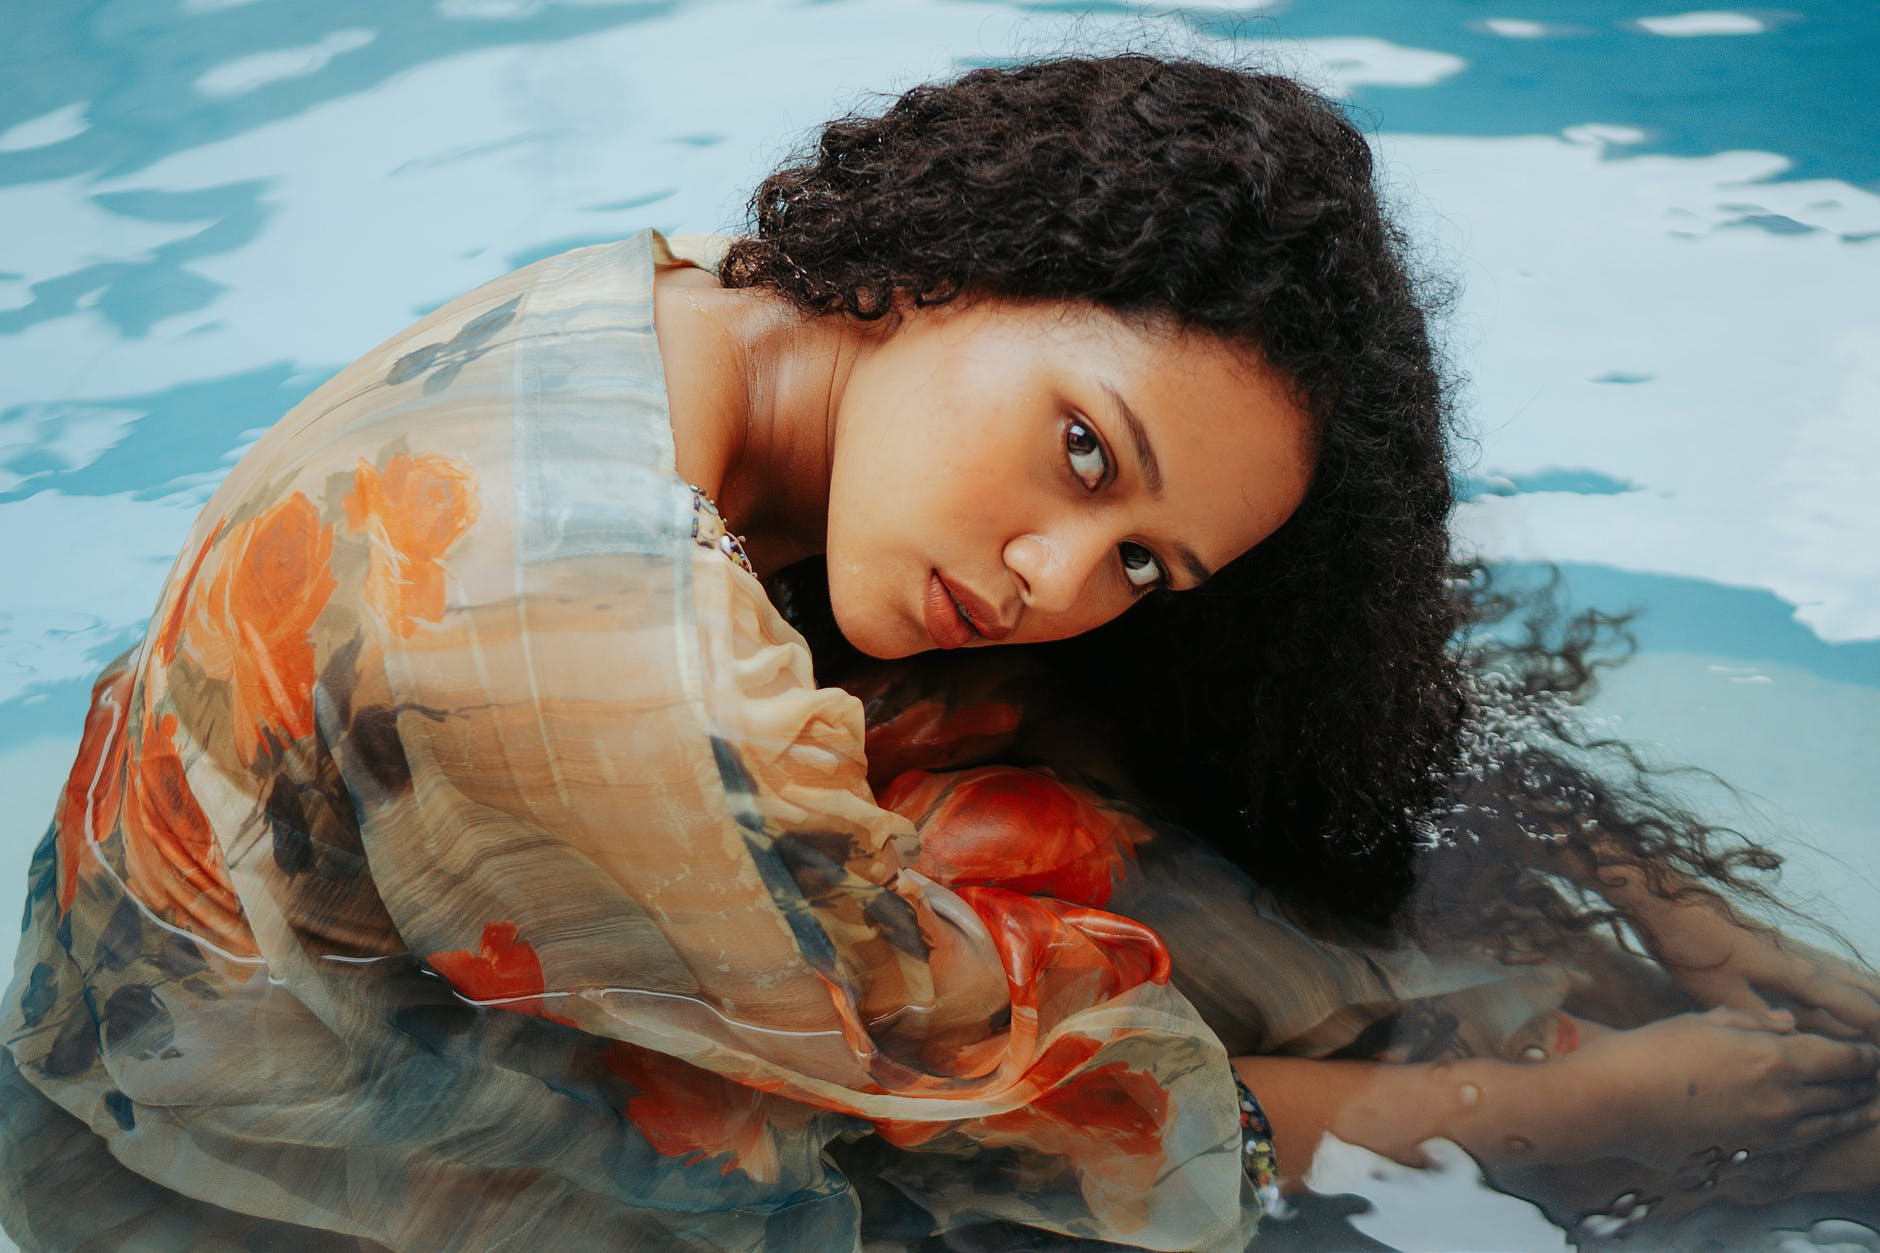 girl in water, pool, yescomusa